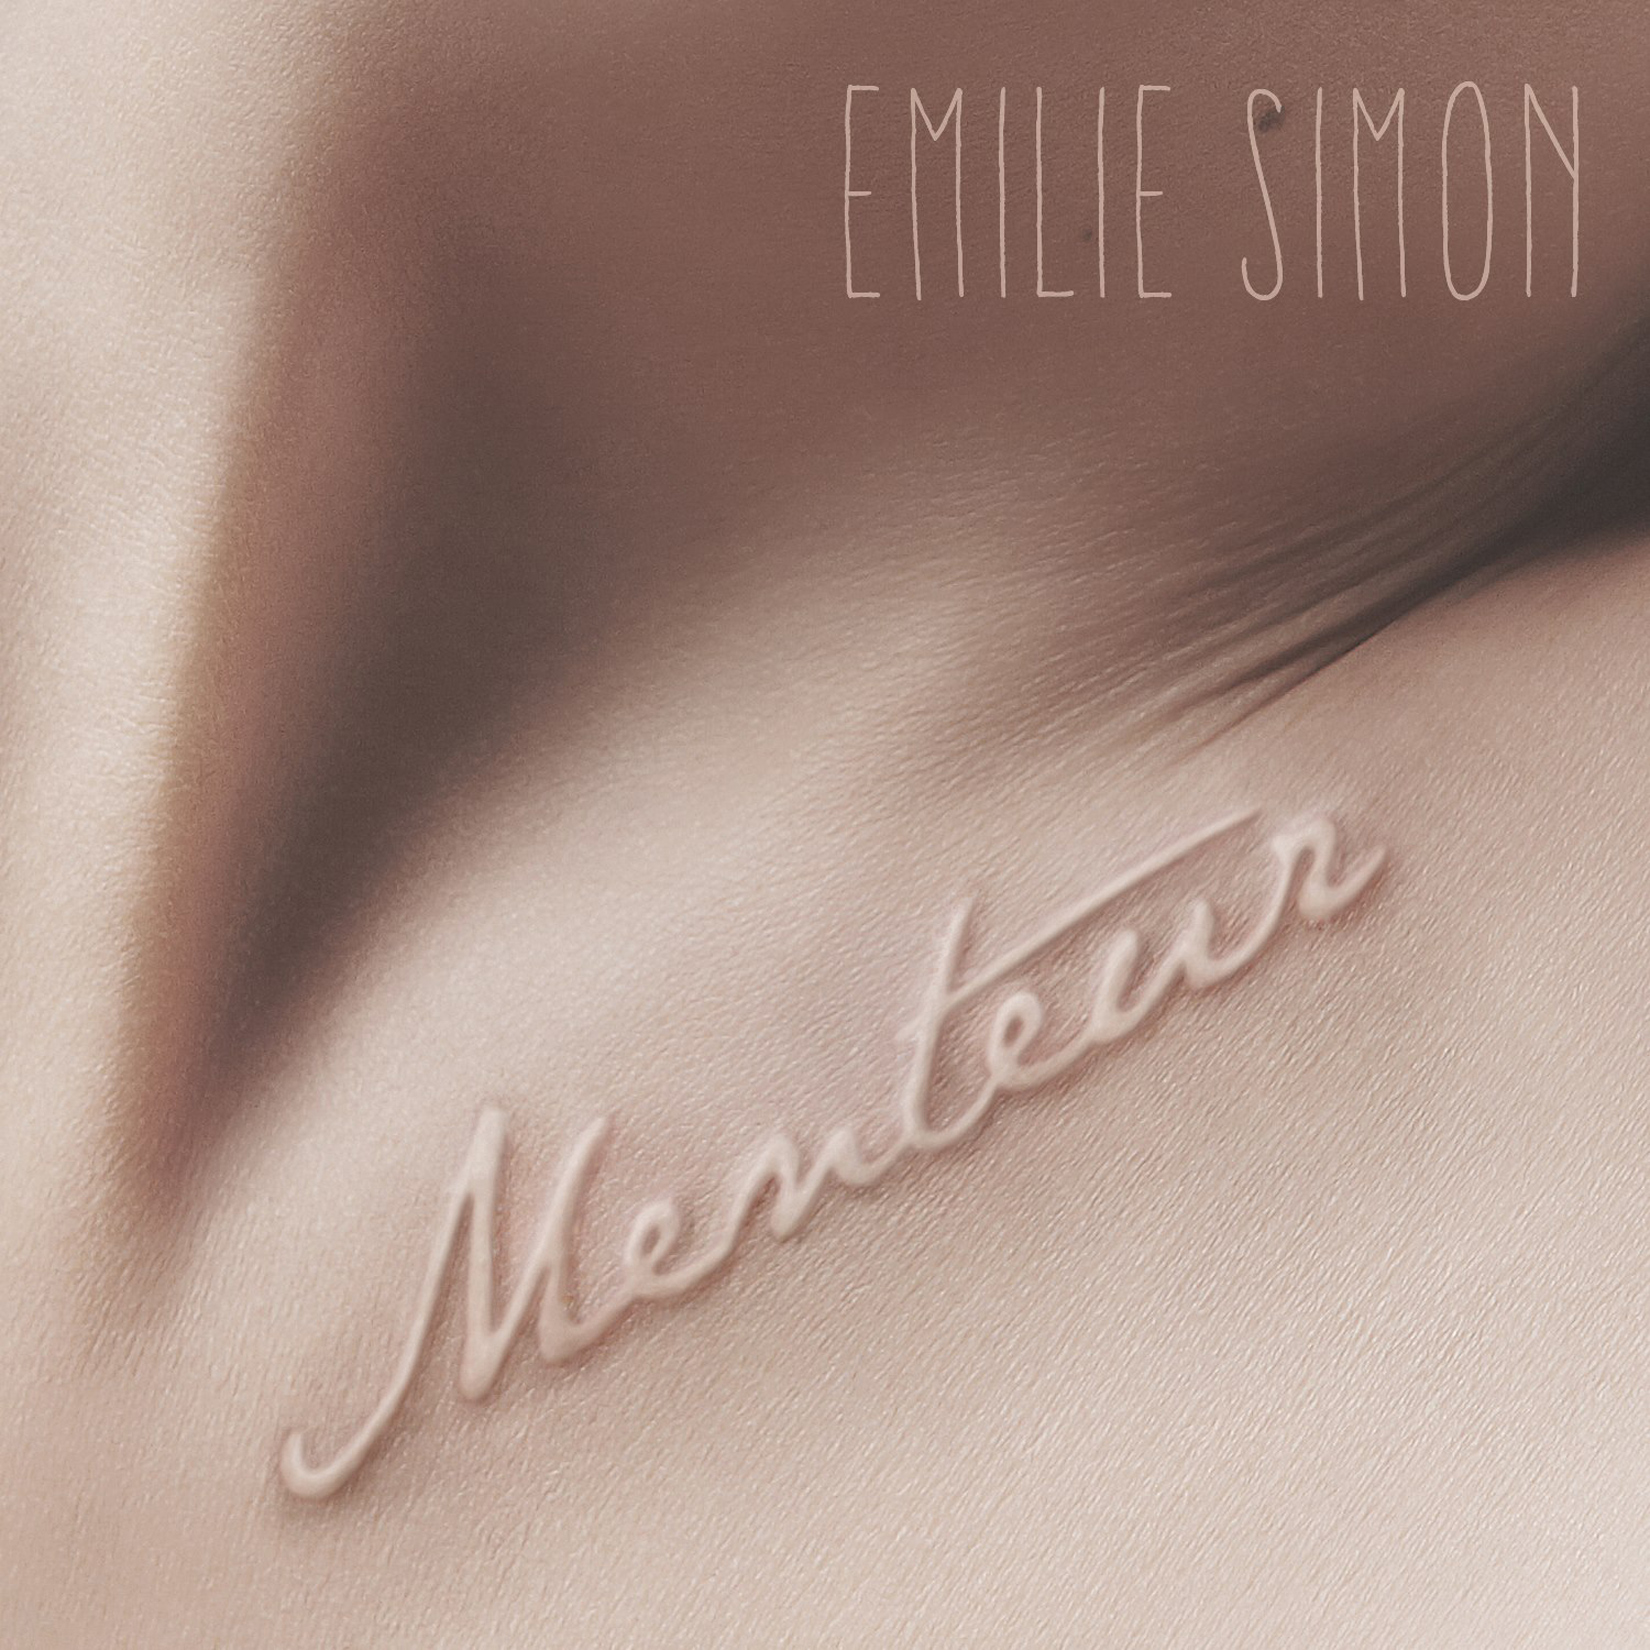 emilie_simon_mue5